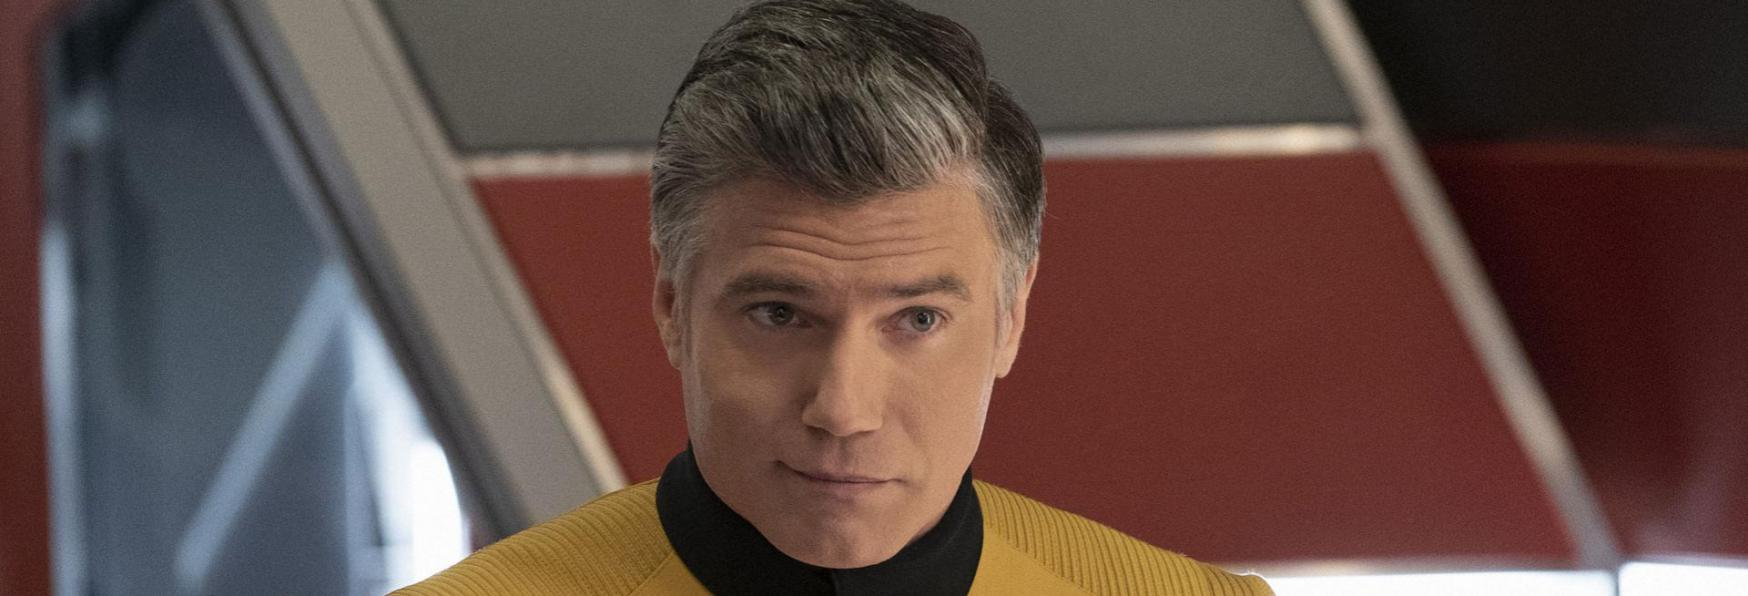 Star Trek: Strange New Worlds - Anson Mount parla della nuova Serie TV